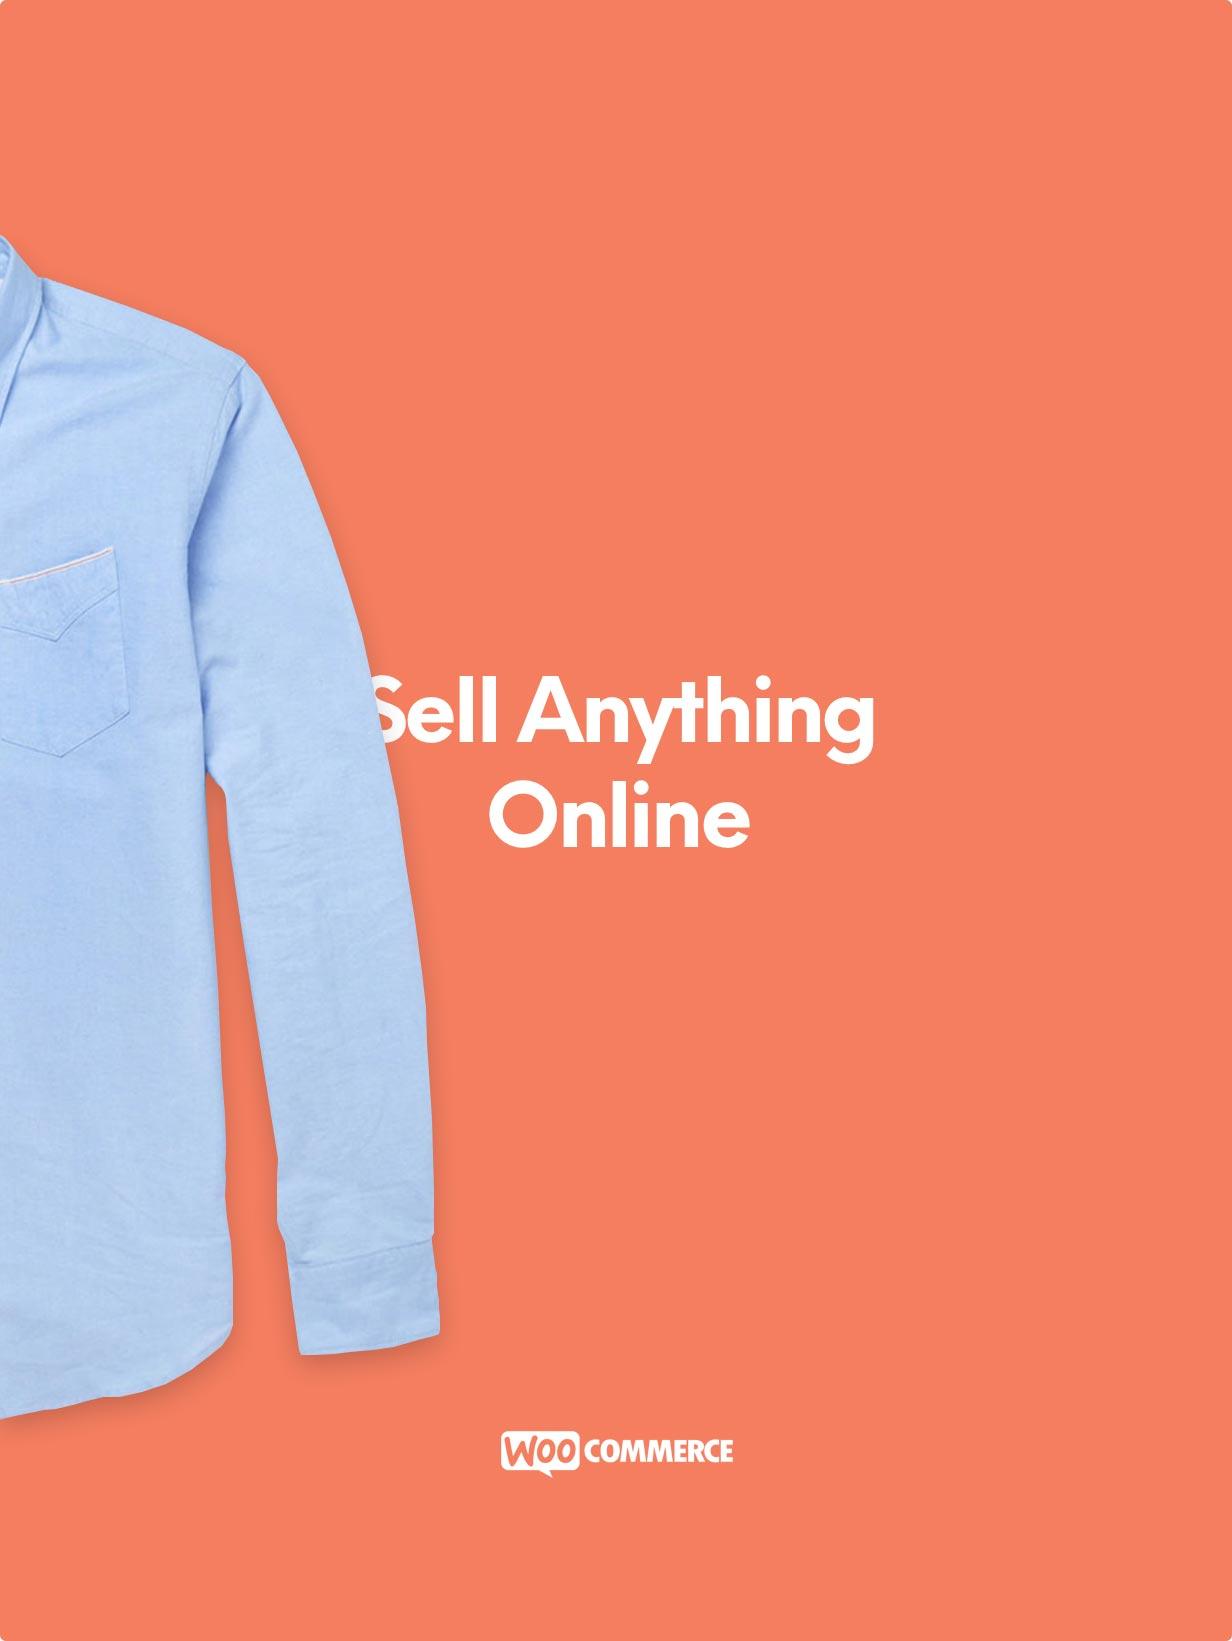 Shopkeeper - eCommerce WP Theme for WooCommerce - 15